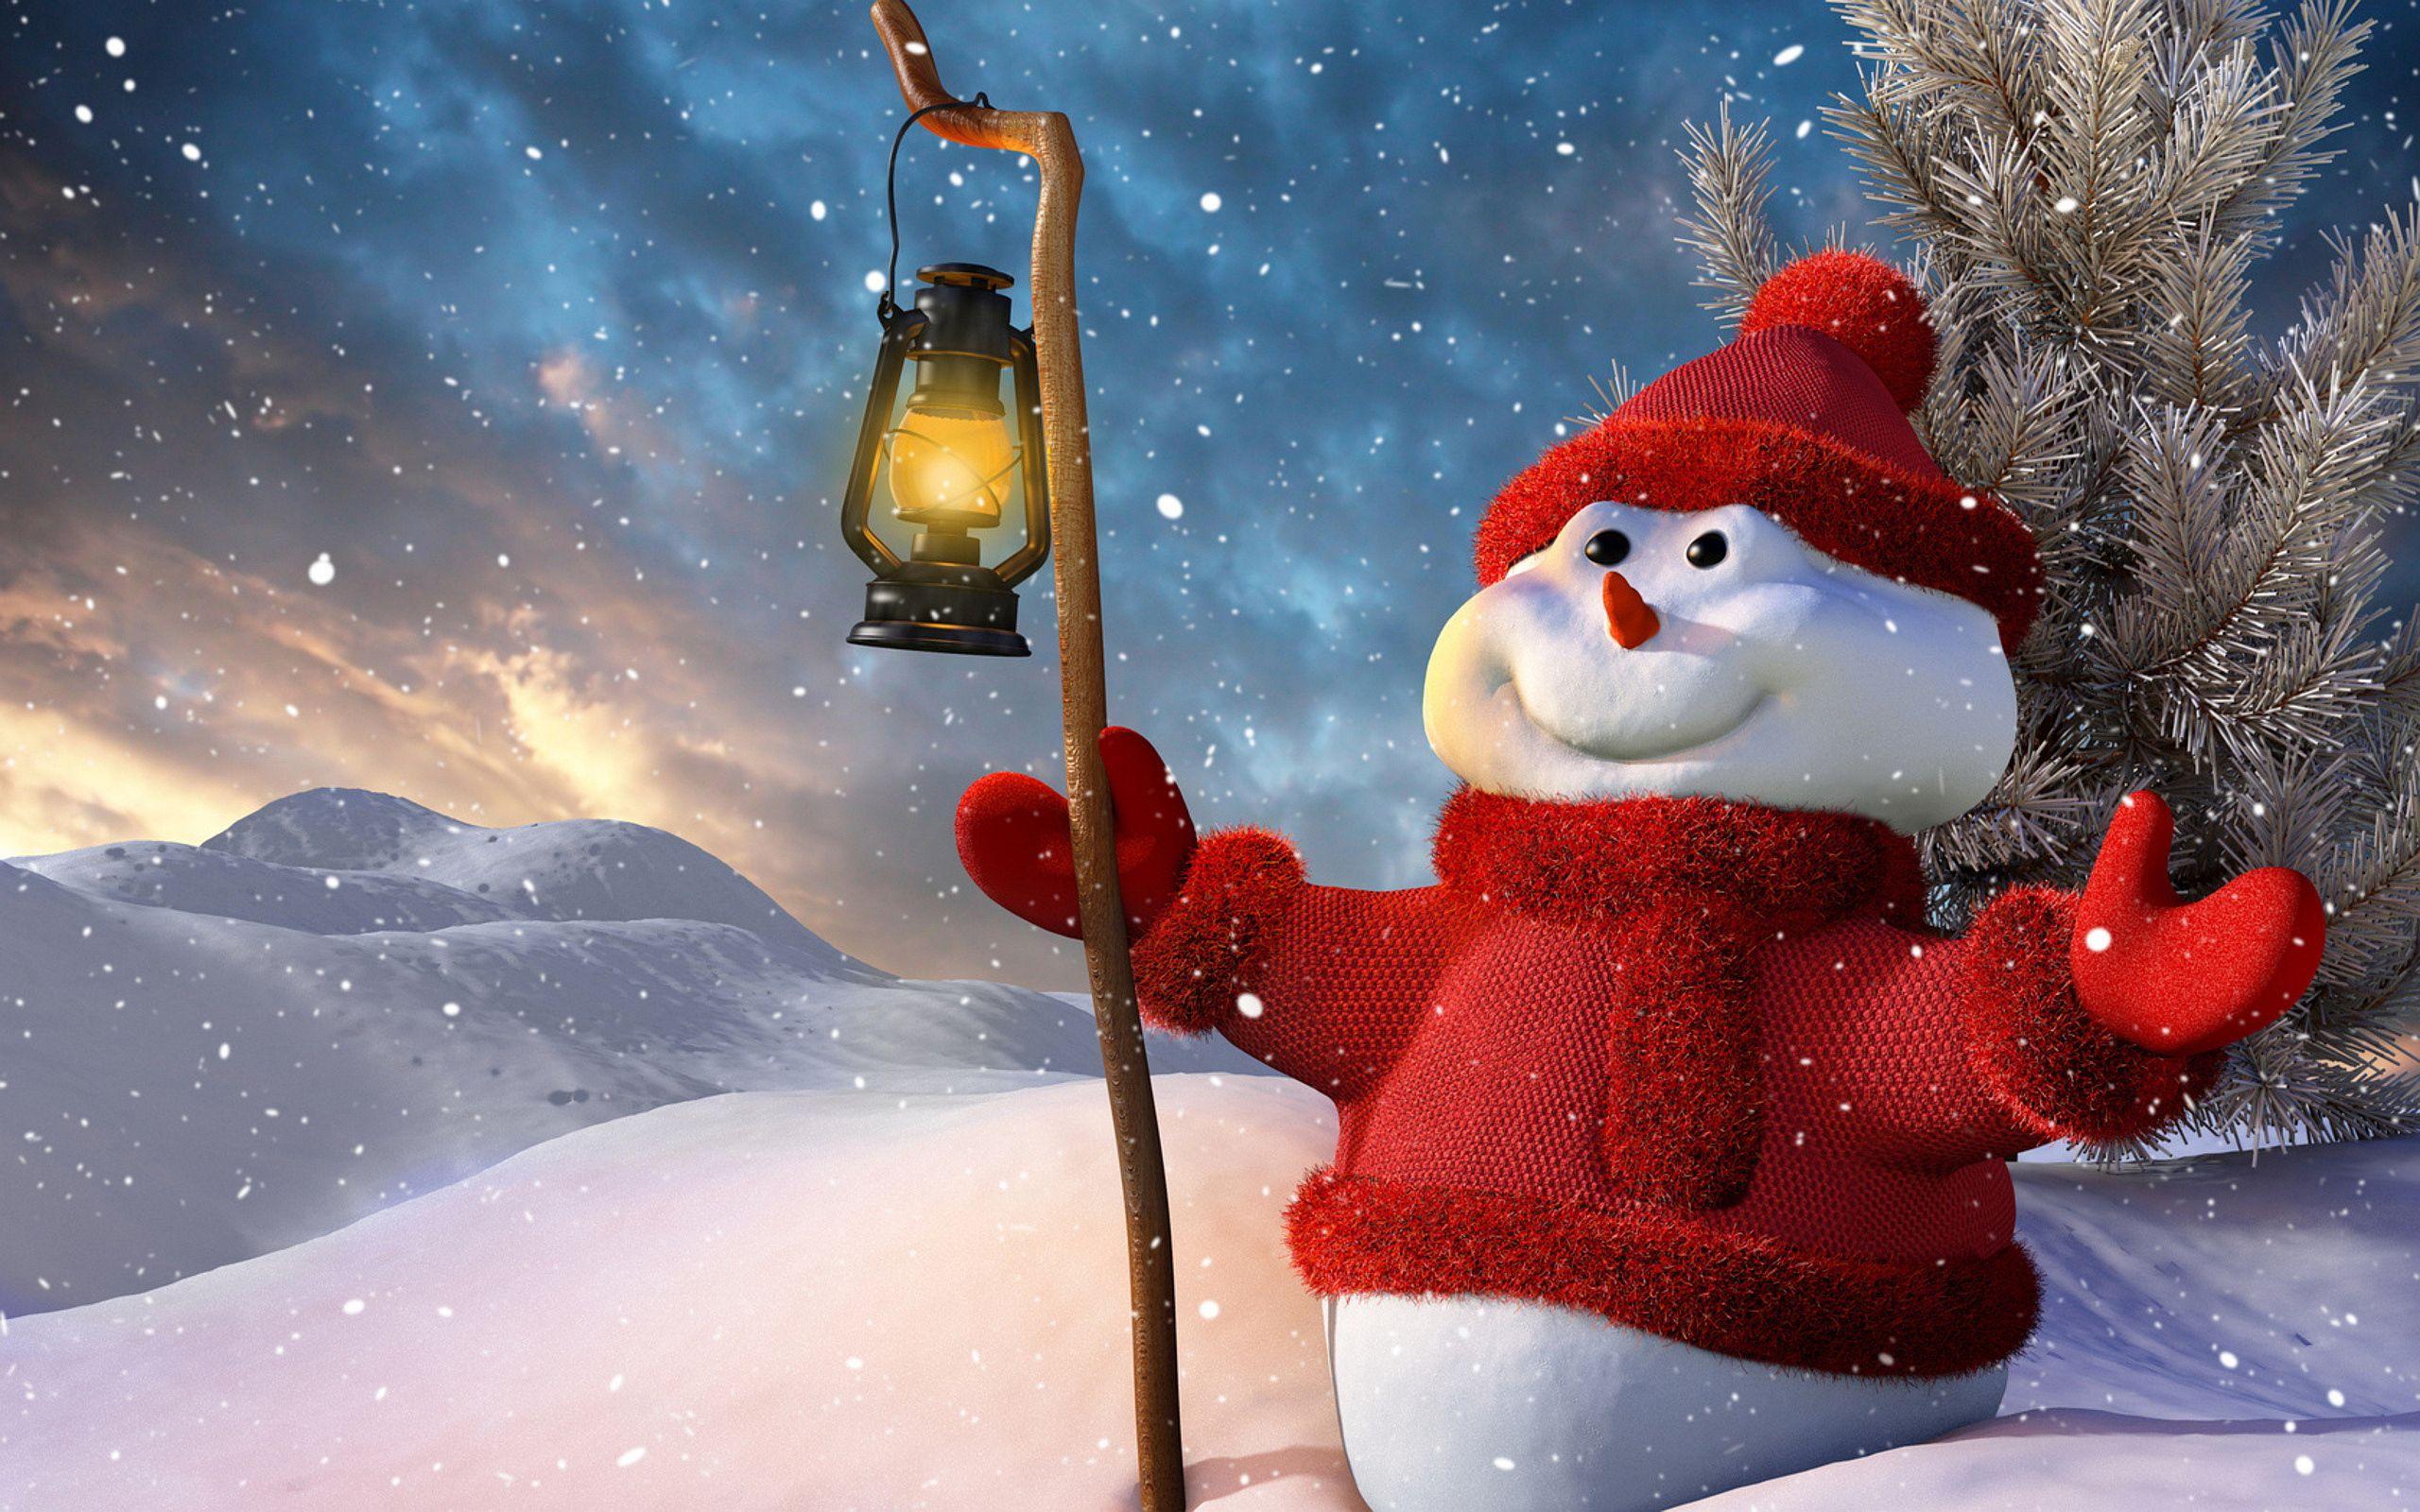 snowman picture hd